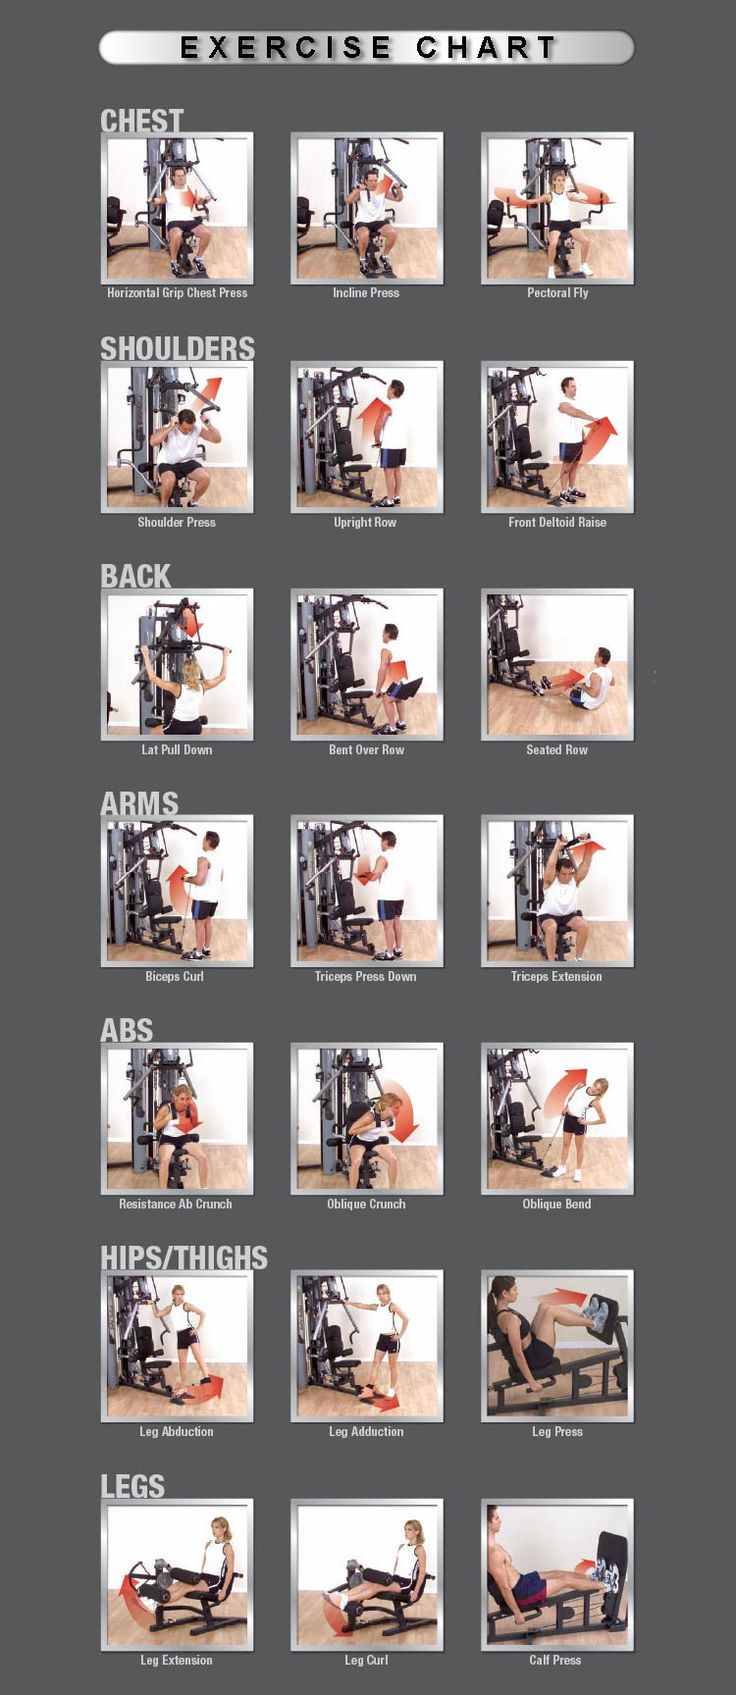 Weider Dual Stack Home Gym Home Gym Hq